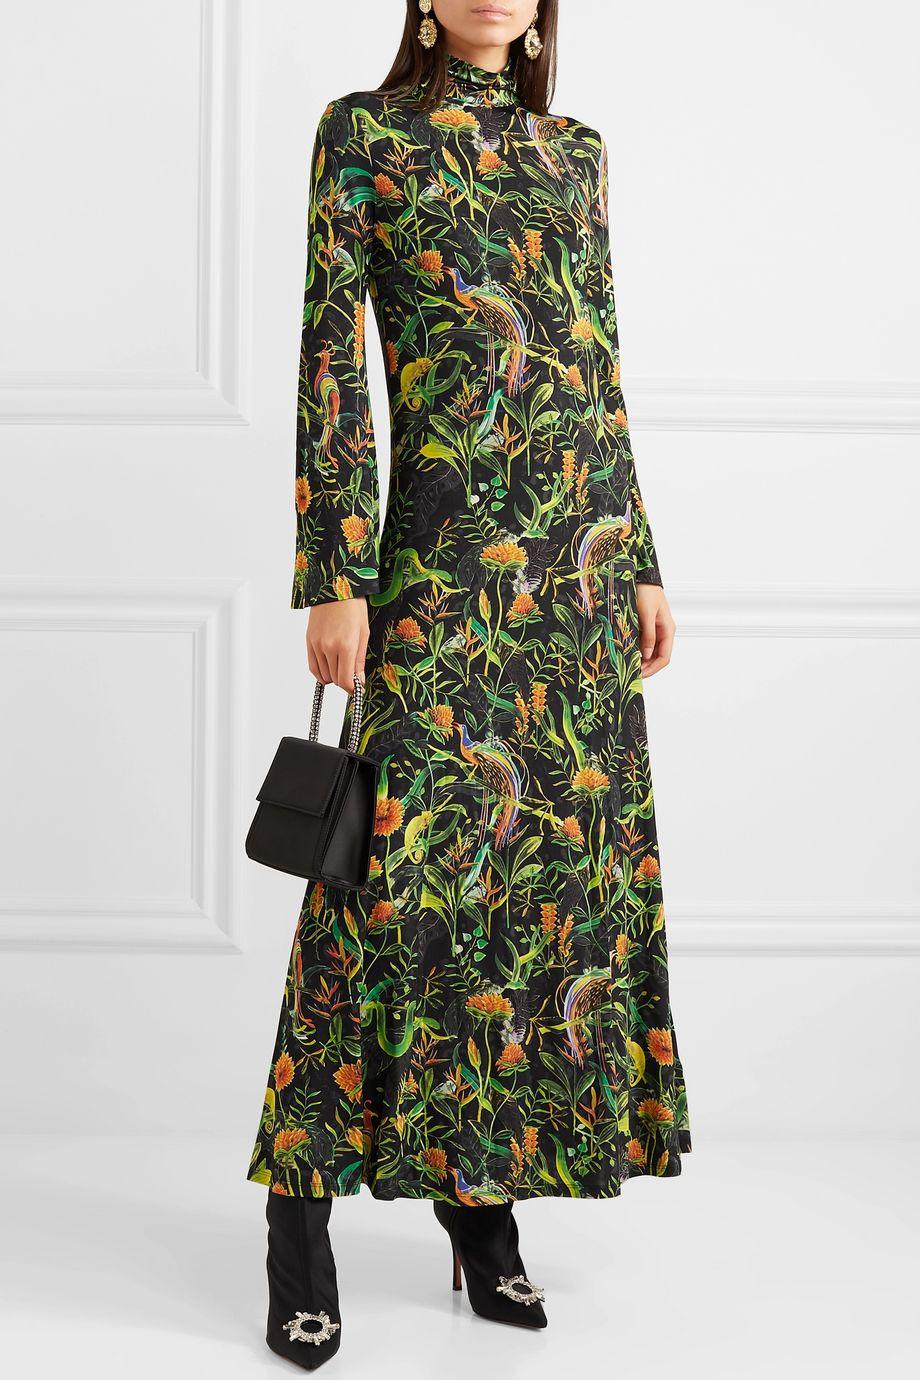 Dodo Bar Or + Annabel's printed stretch-jersey turtleneck midi dress